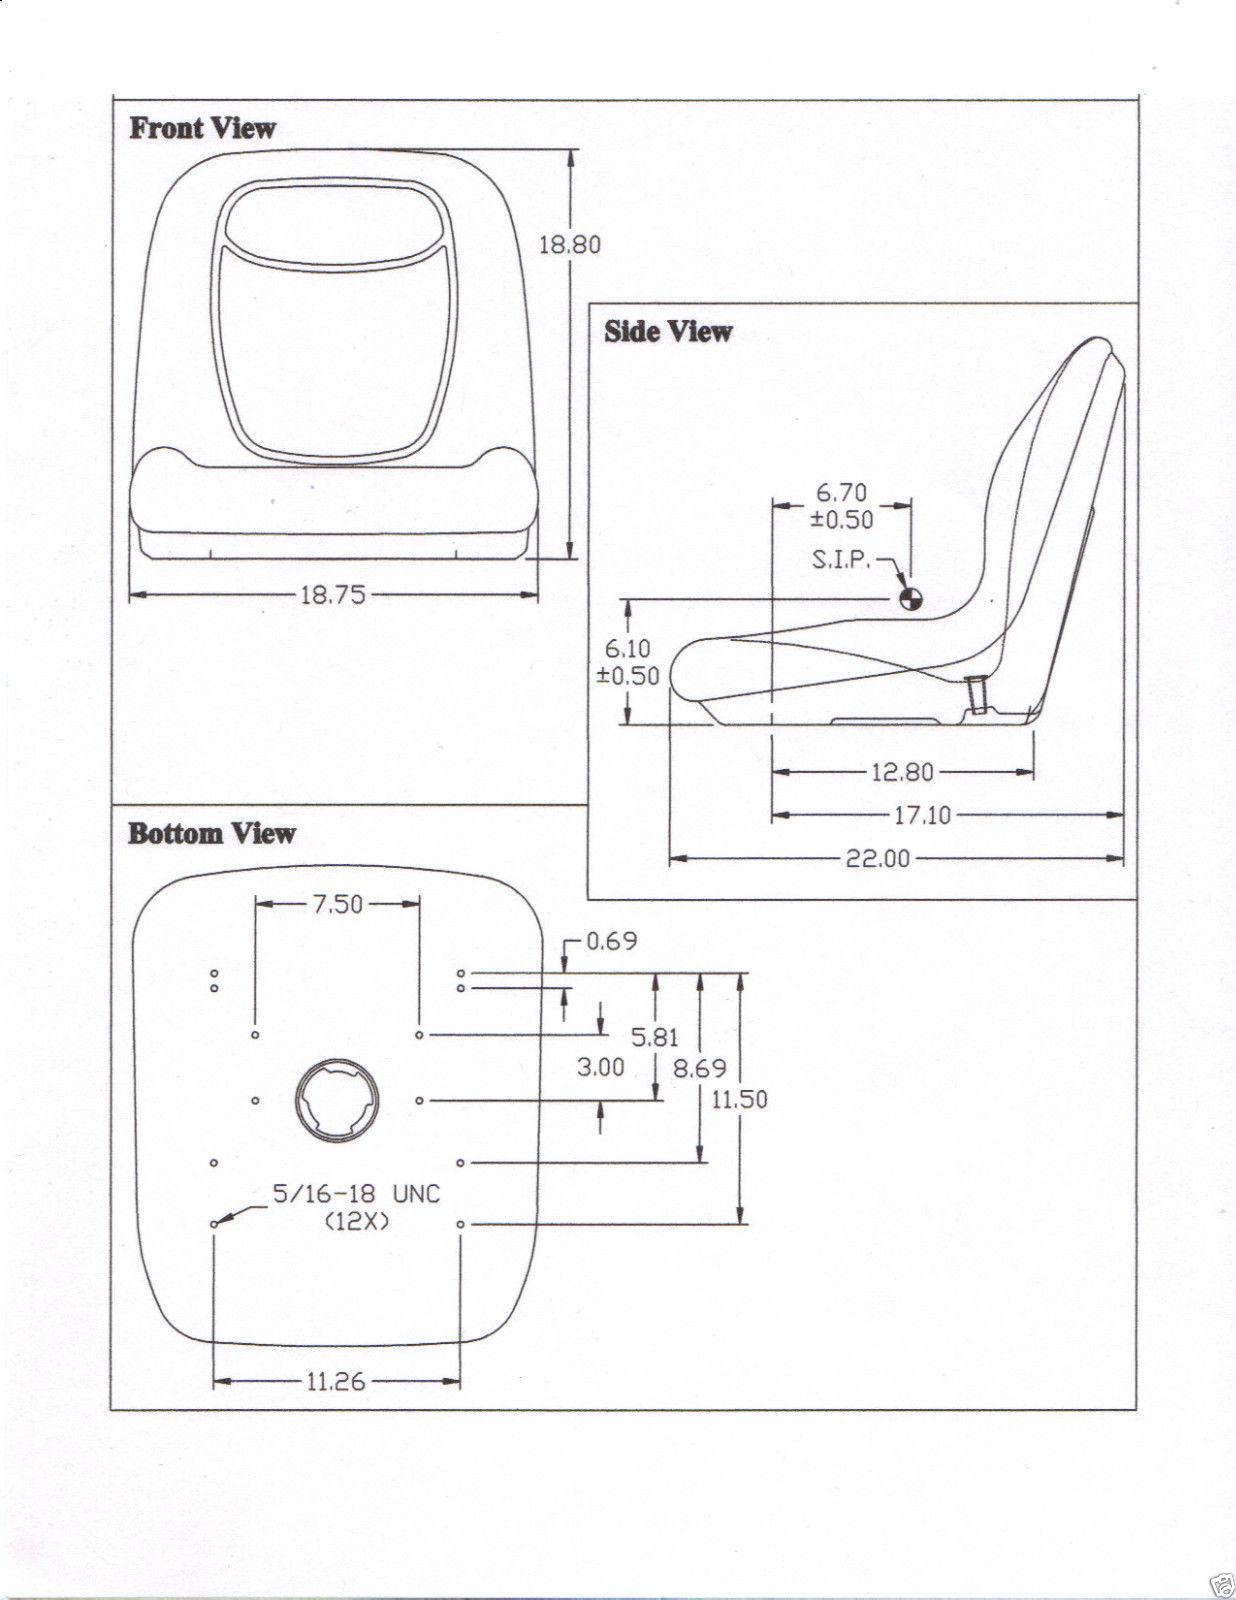 dixie chopper mower wiring diagram wiring diagramsdixie chopper mower wiring diagram wiring diagramdixie chopper mower wiring diagram wiring librarydixie chopper, zero